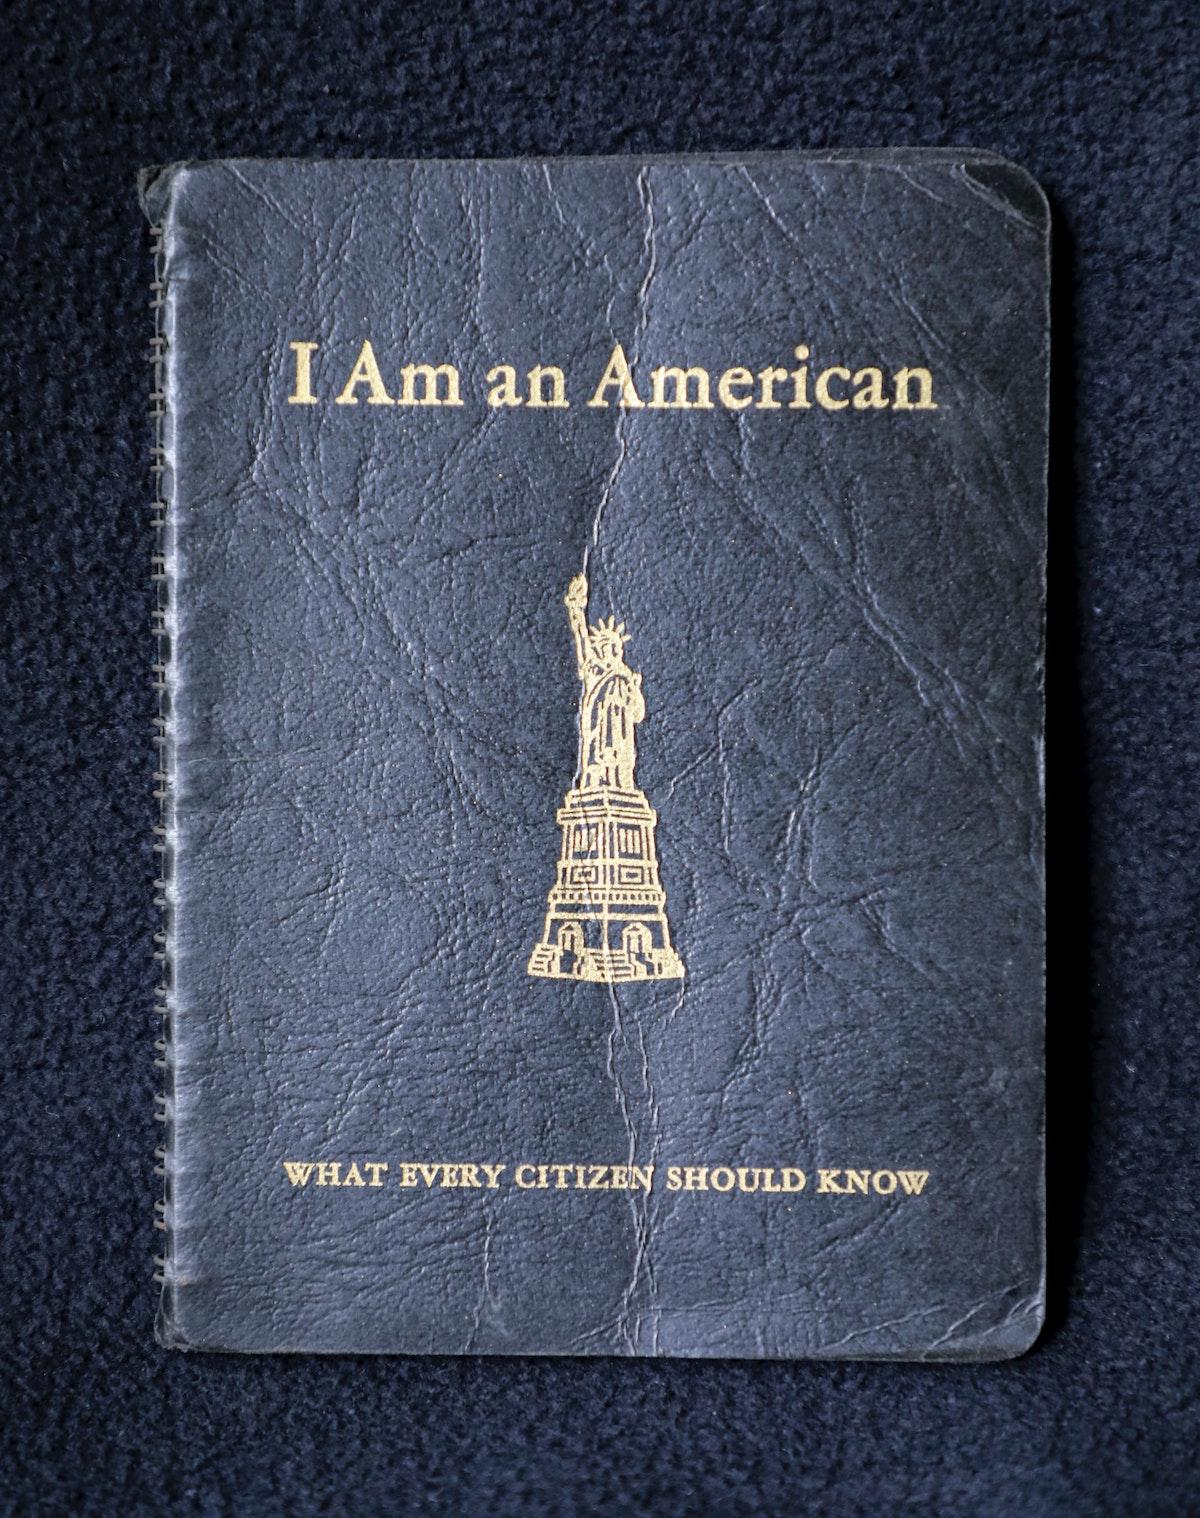 book - I am an American